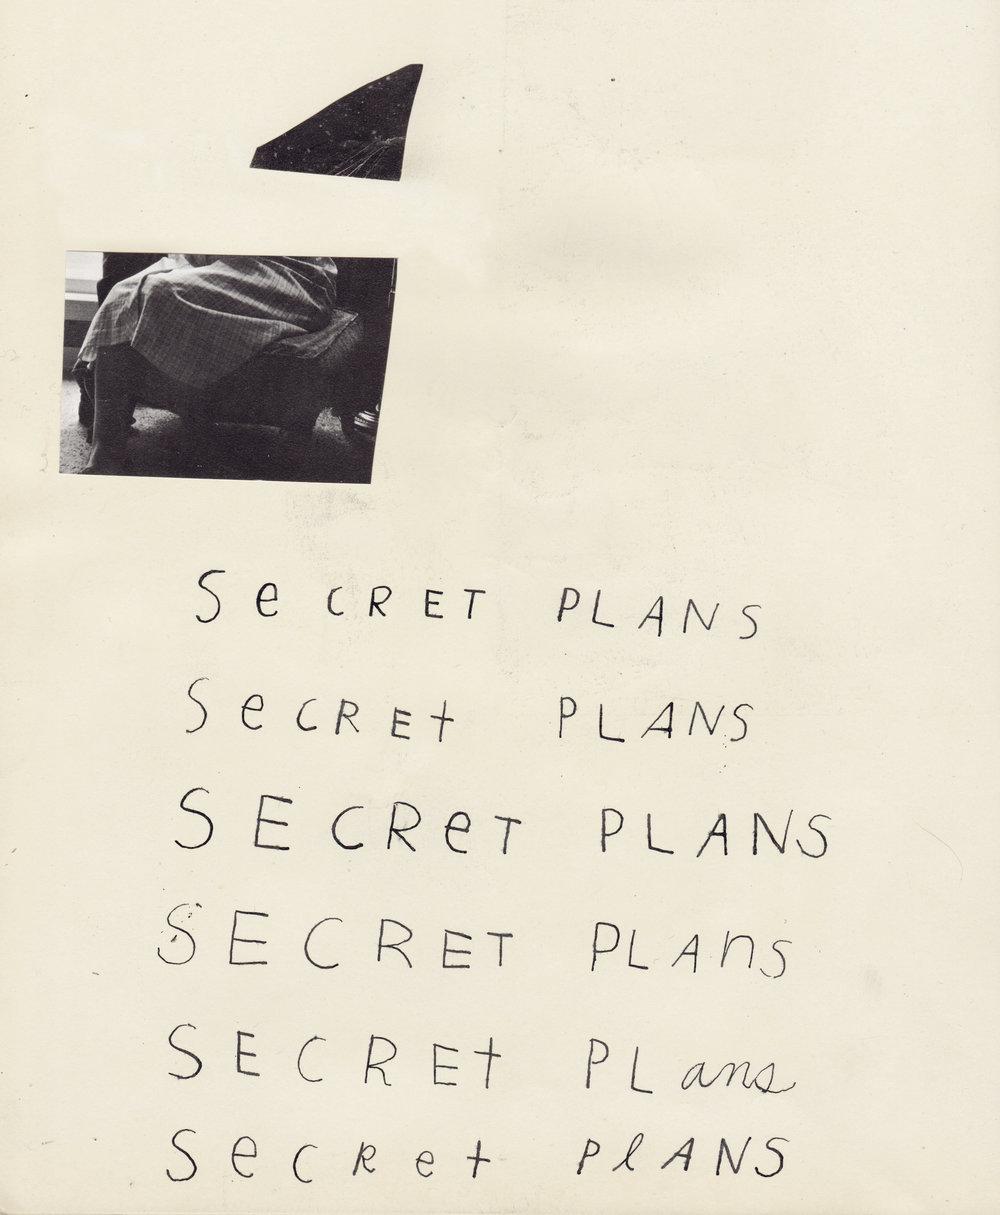 secretplans.jpeg